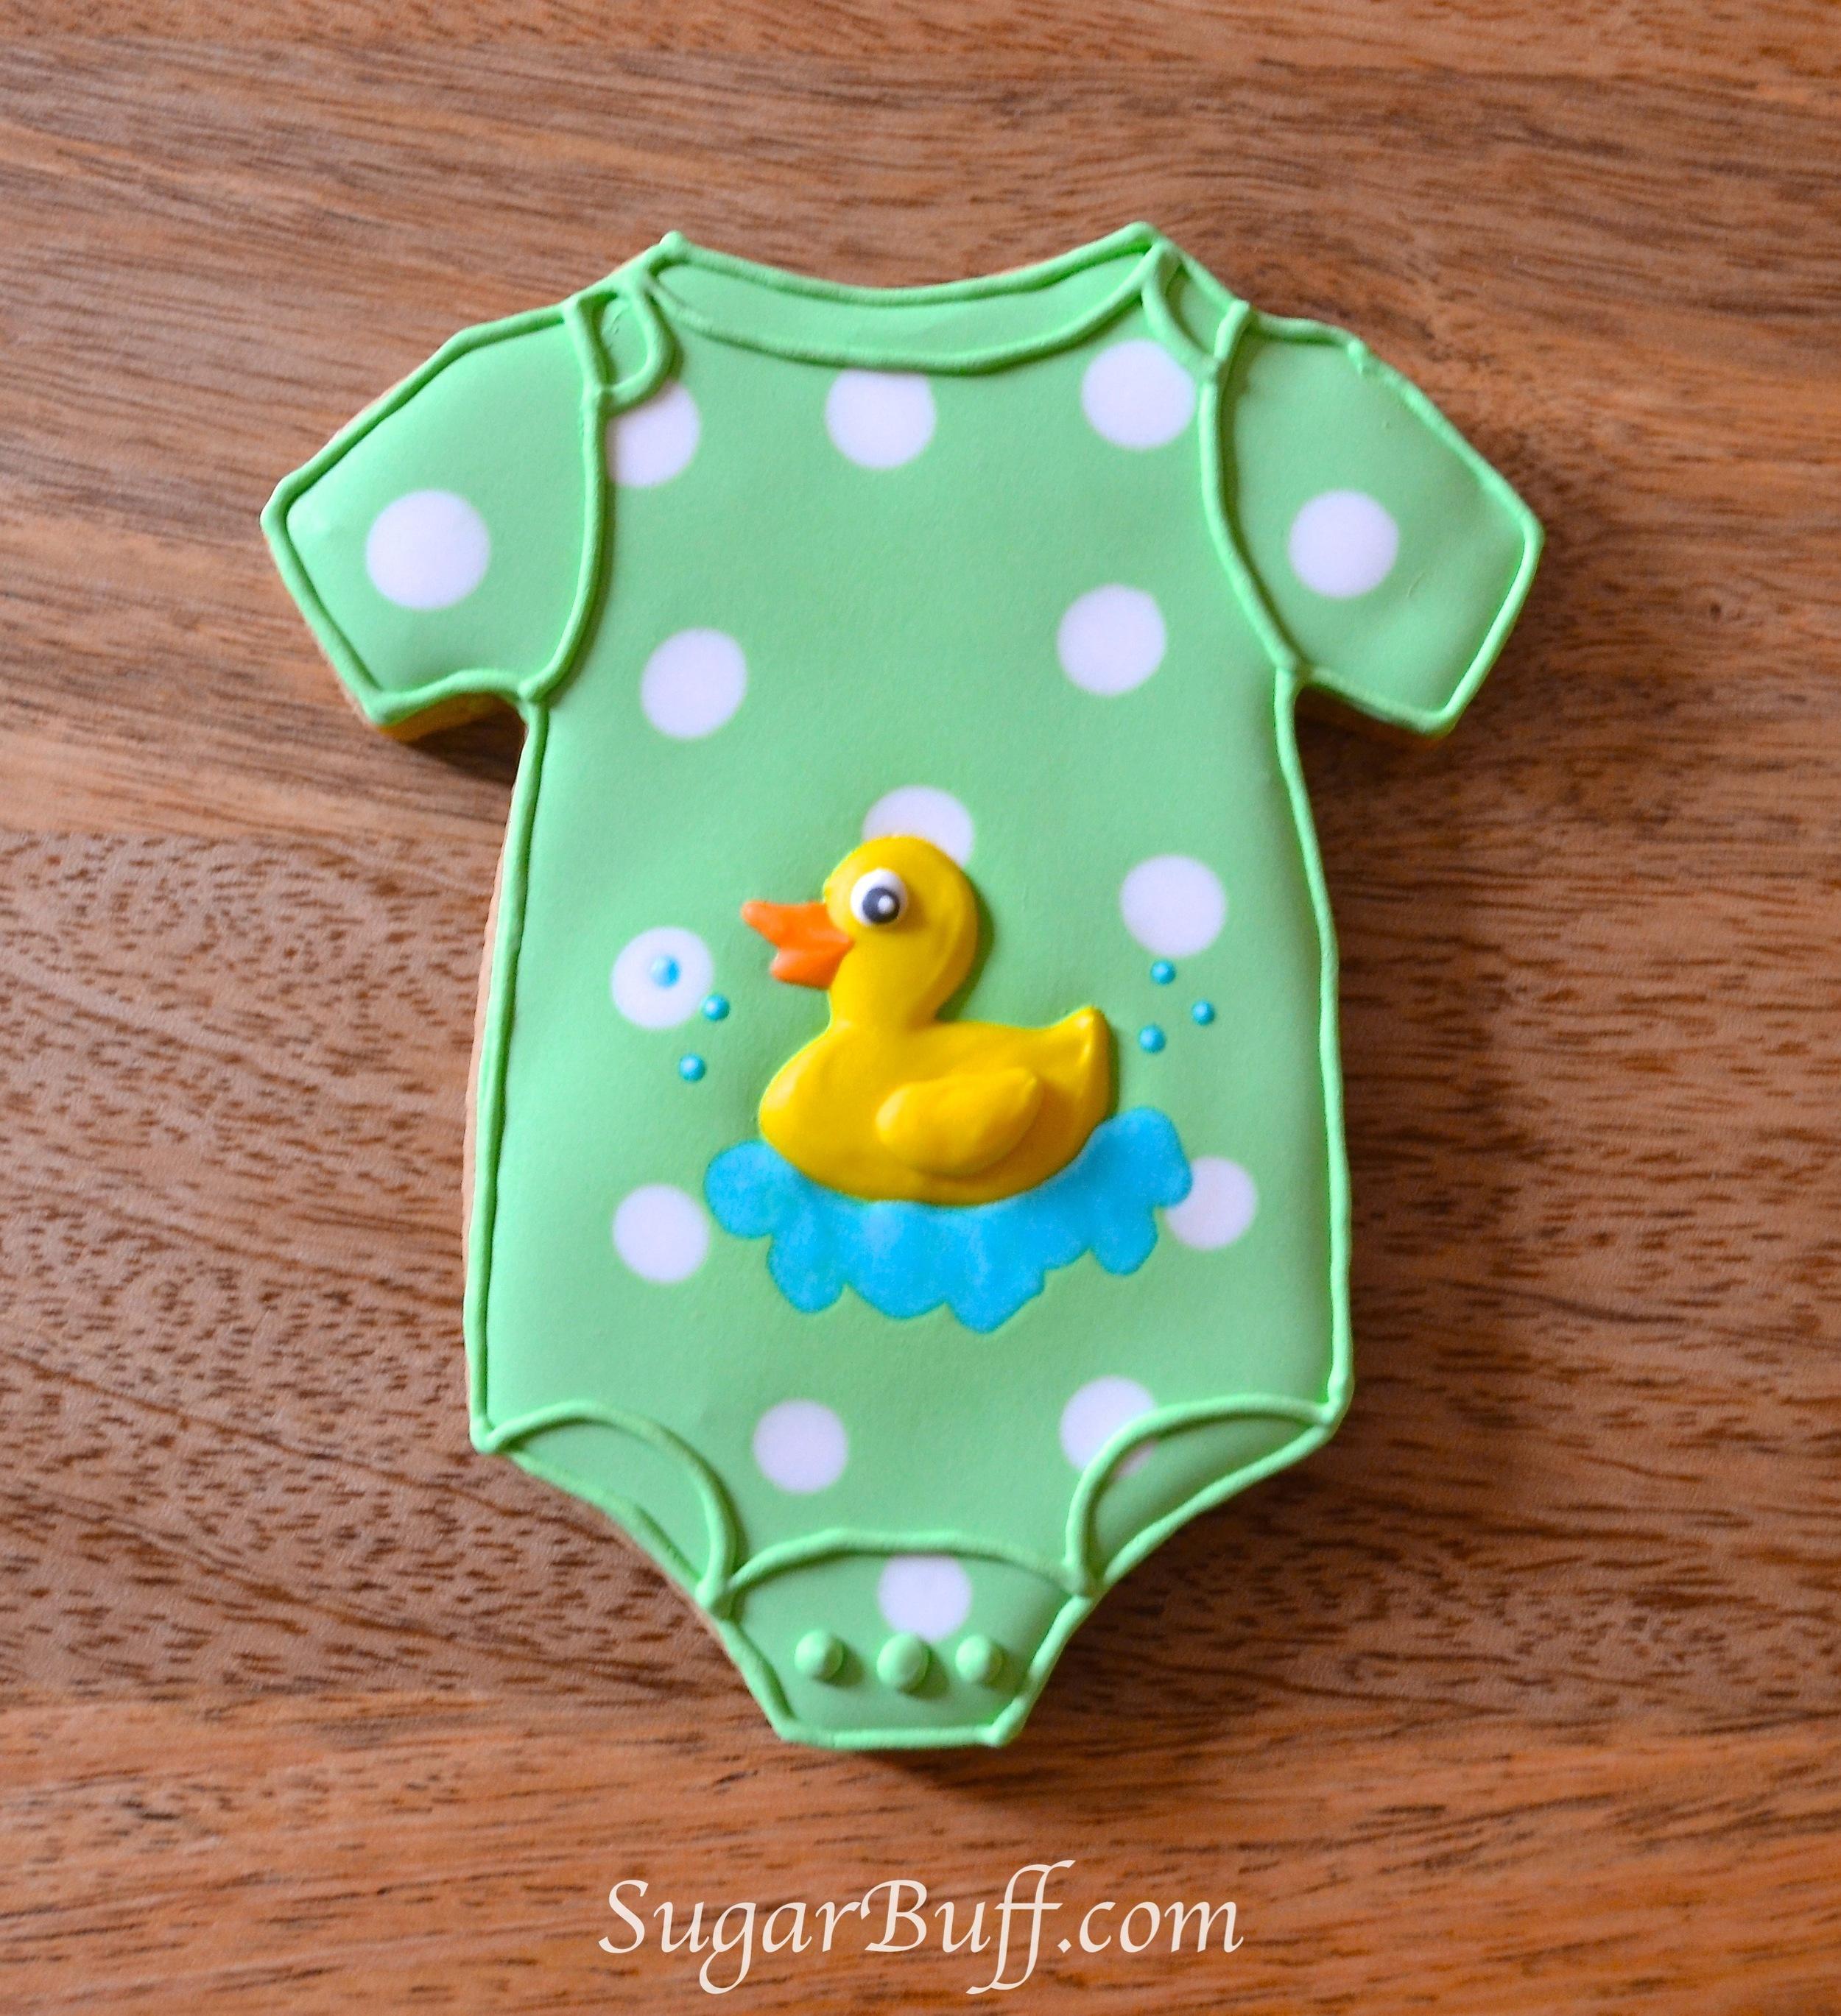 Rubber Ducky Baby Onesie